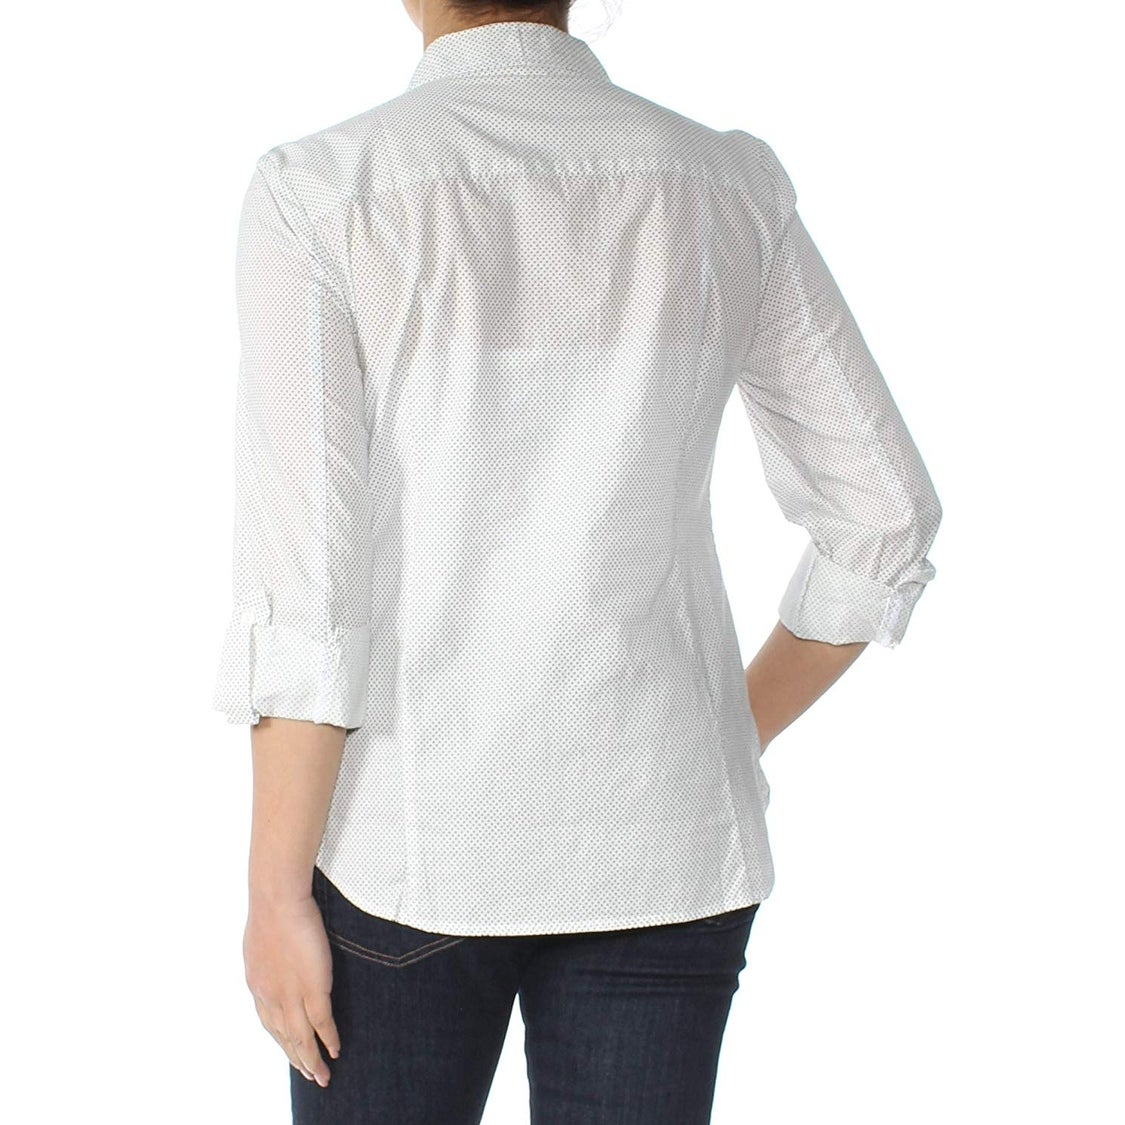 Tommy Hilfiger Women Large Dot Print Button Down Shirt